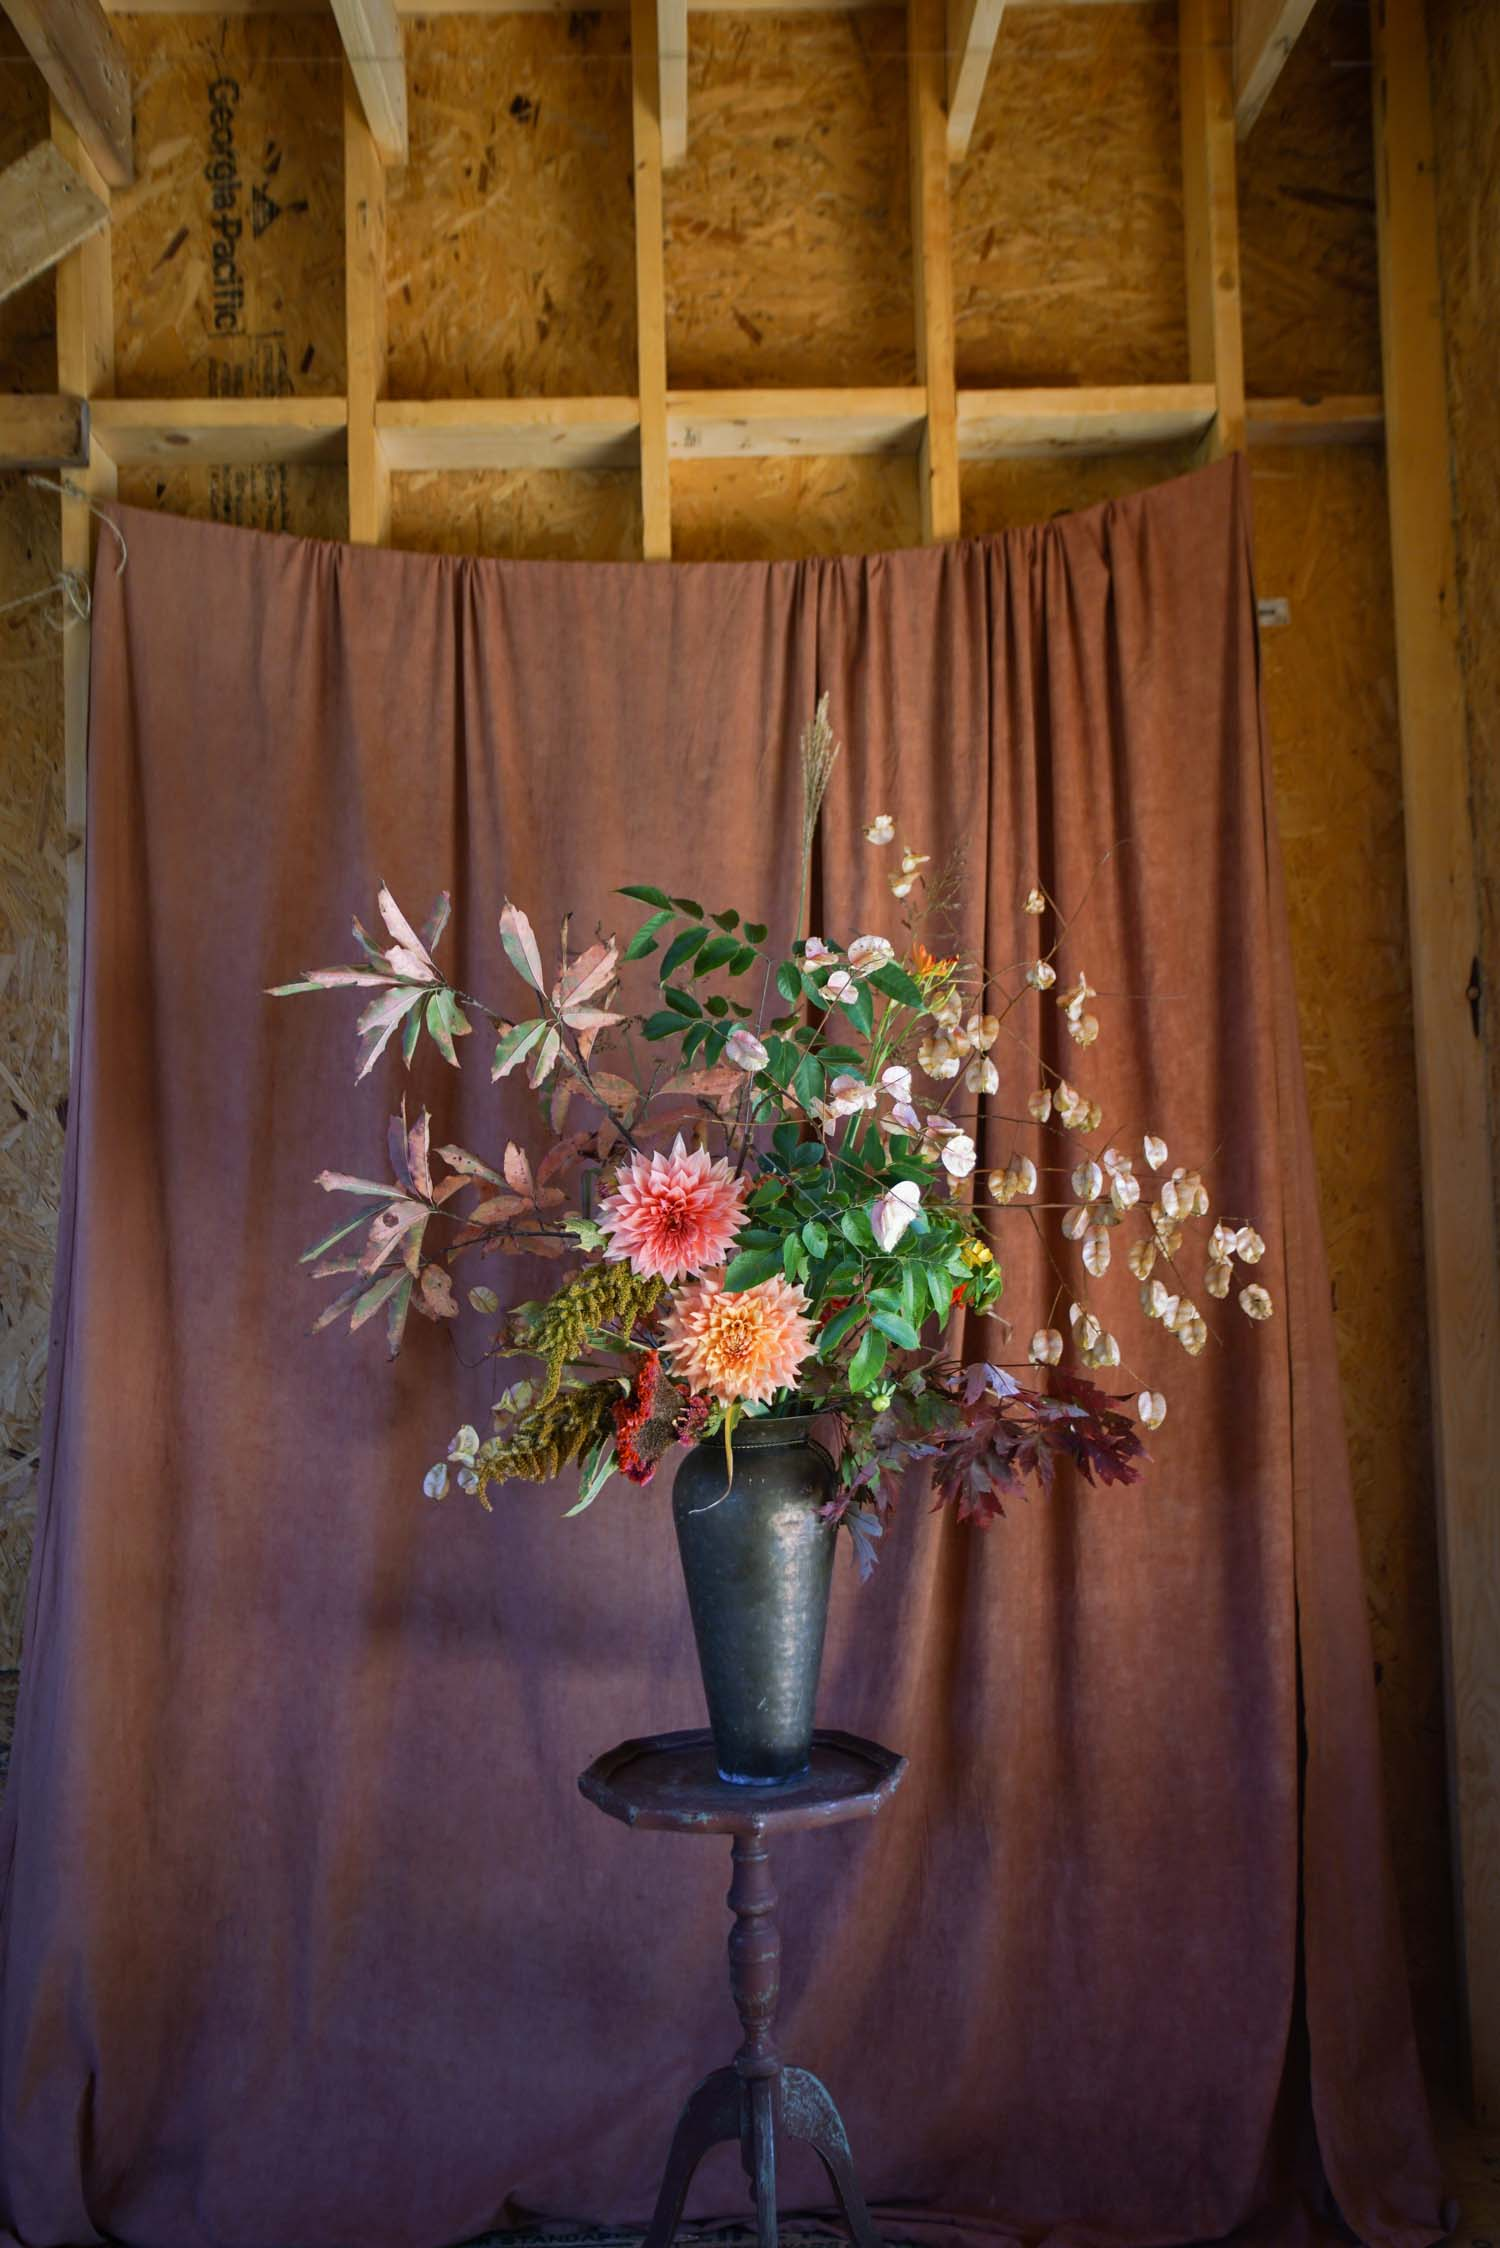 RA_3 porch farm 2016 flower social-2016101709005.jpg